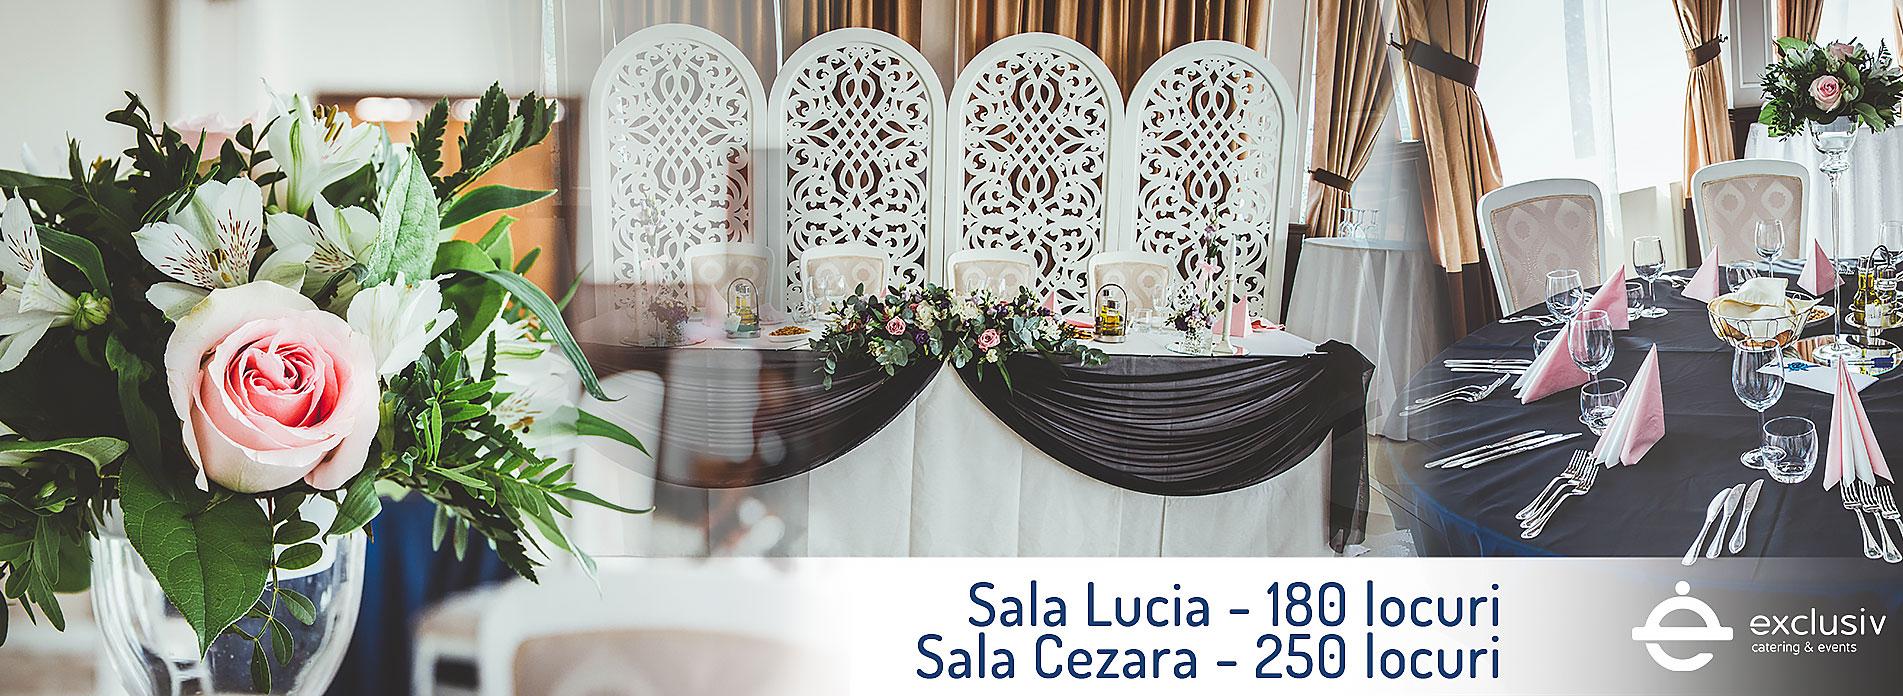 banner-site-exclusiv-catering-sali-de-nunta-cluj